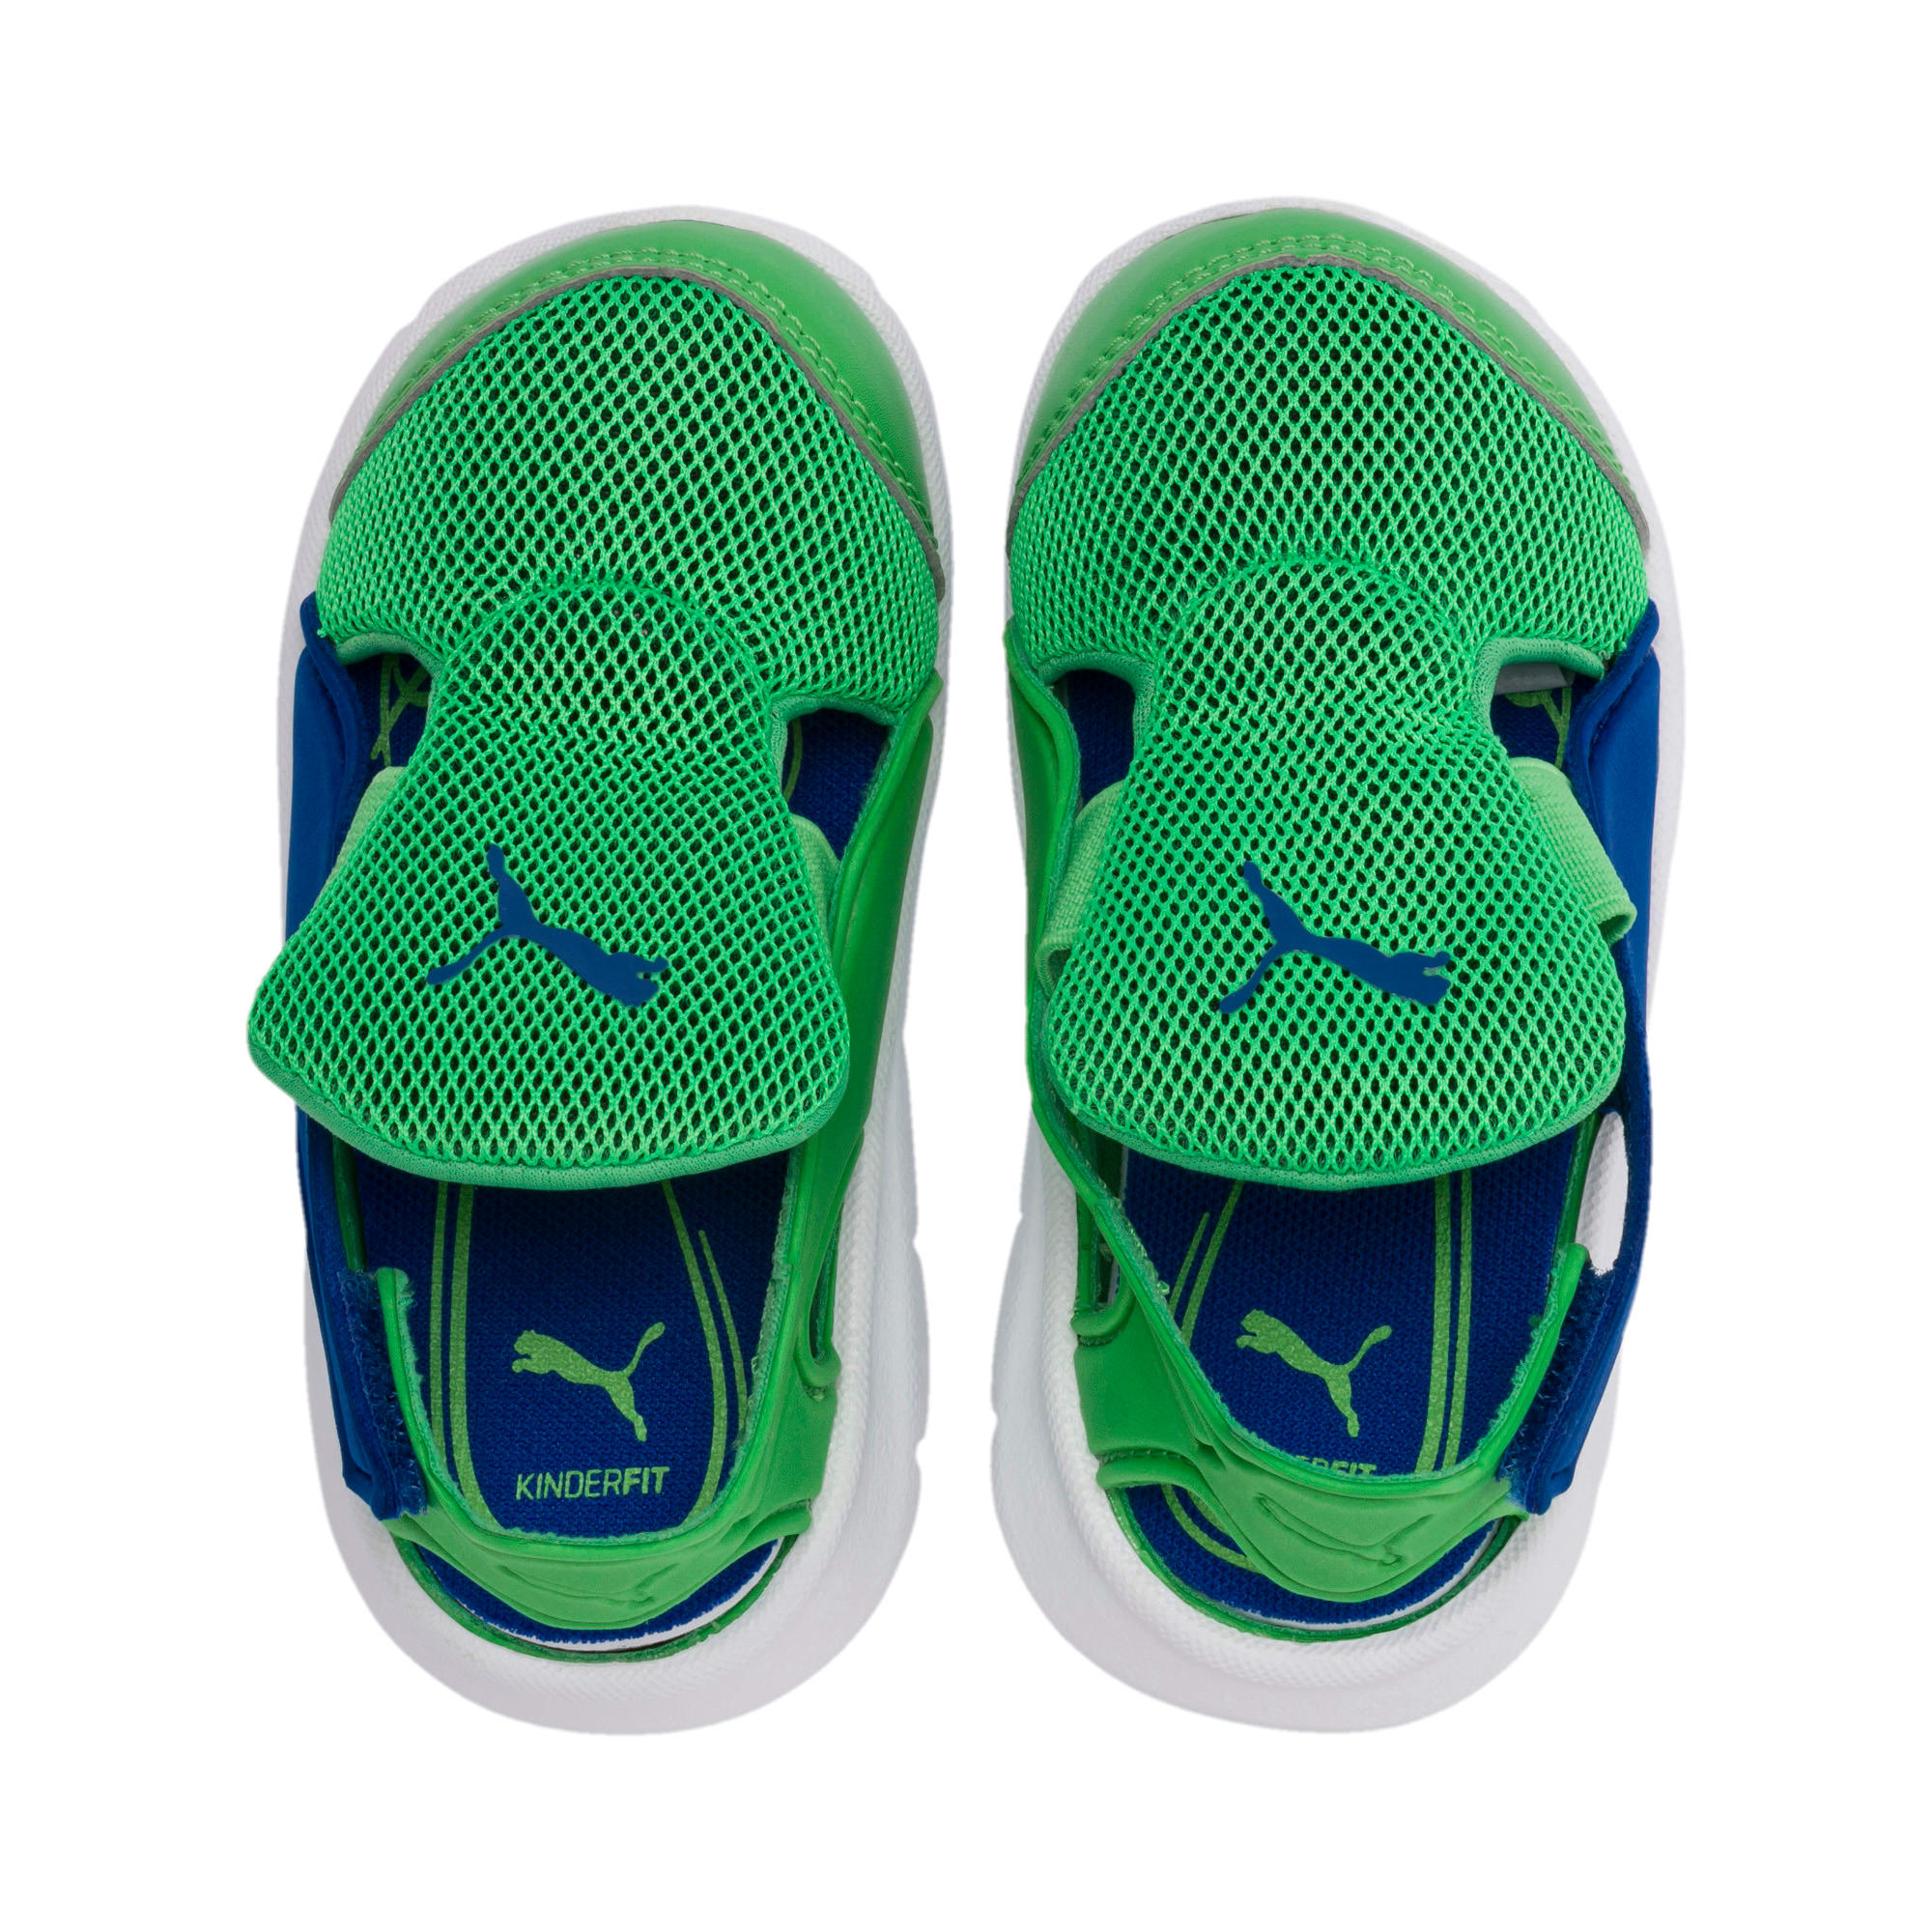 Thumbnail 6 of Bao 3 Open Little Kids' Shoes, Surf The Web-Irish Green, medium